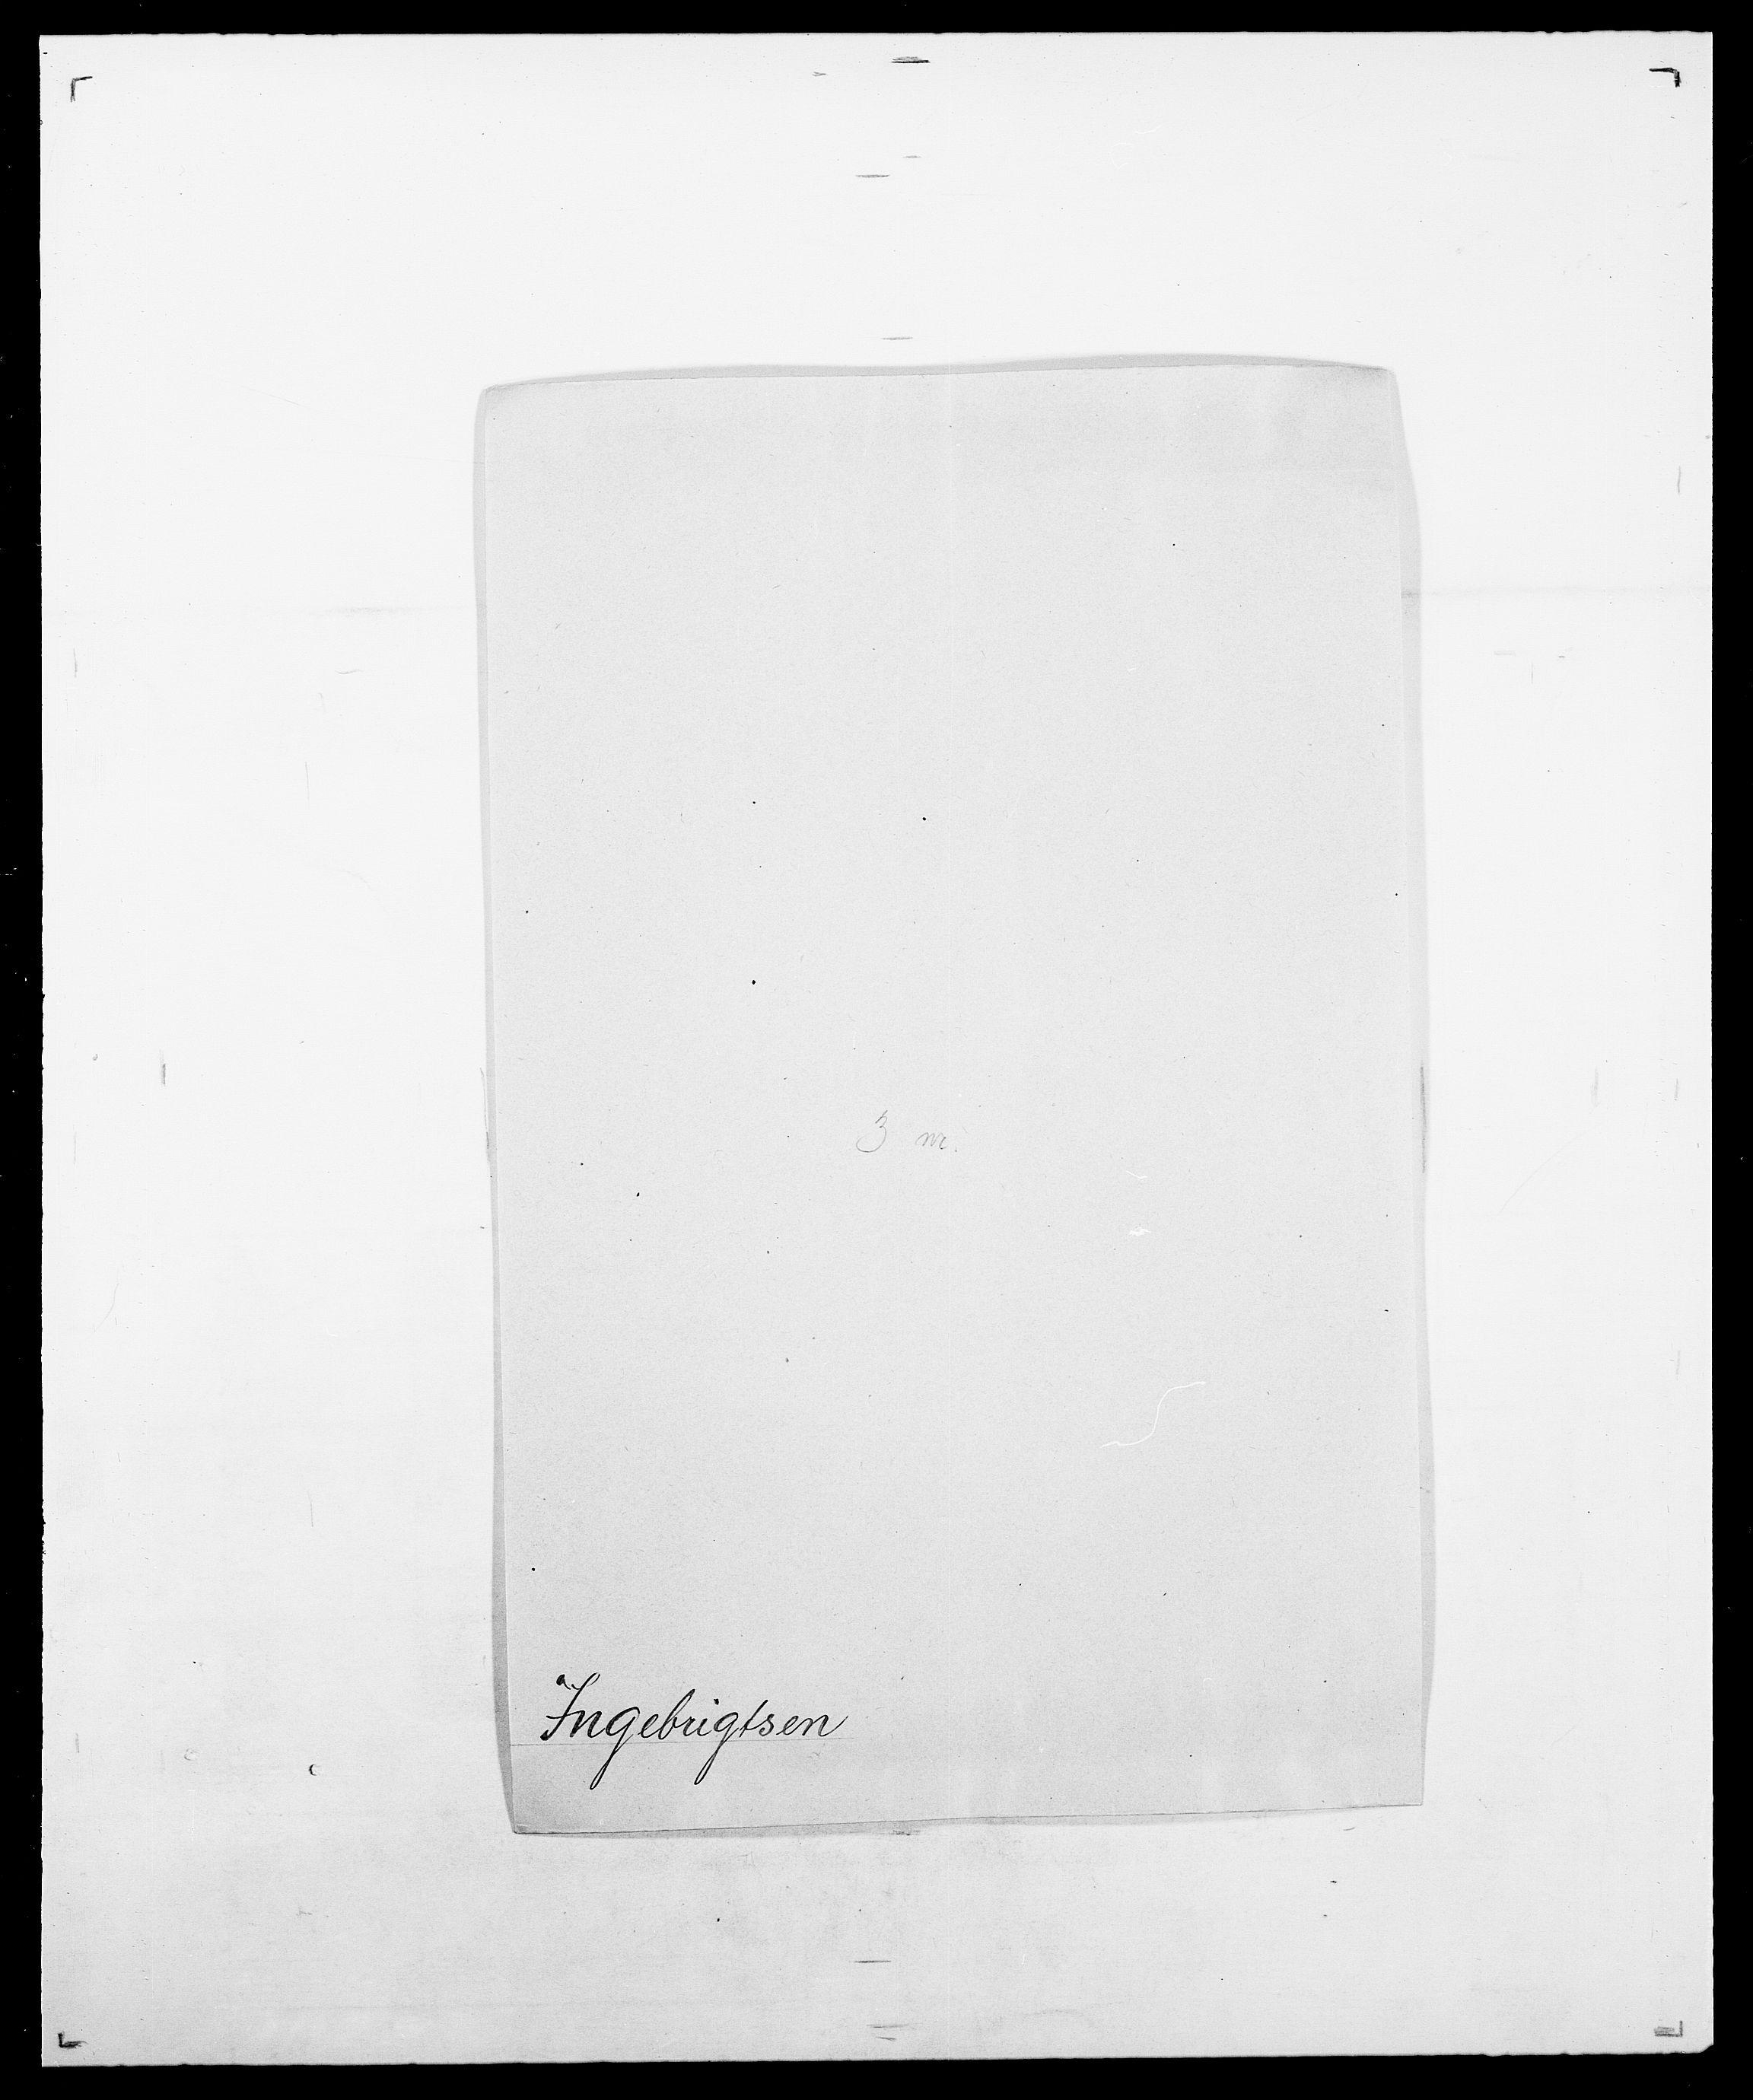 SAO, Delgobe, Charles Antoine - samling, D/Da/L0019: van der Hude - Joys, s. 776